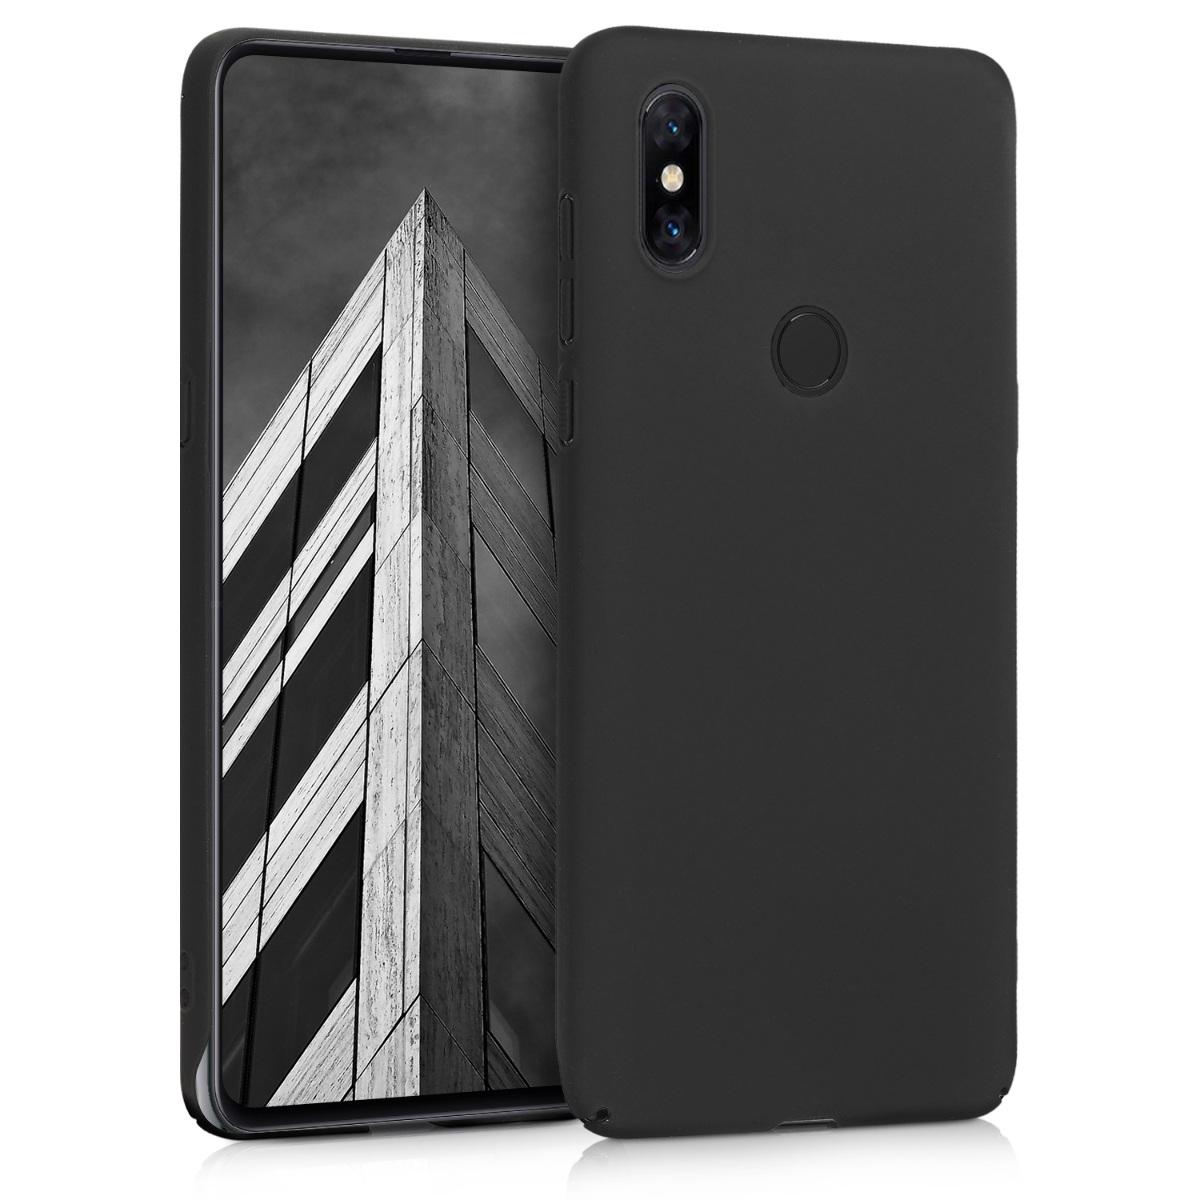 KW Slim Anti-Slip Cover - Σκληρή Θήκη Καουτσούκ Xiaomi Mi Mix 3 - Μαύρο (46340.47)